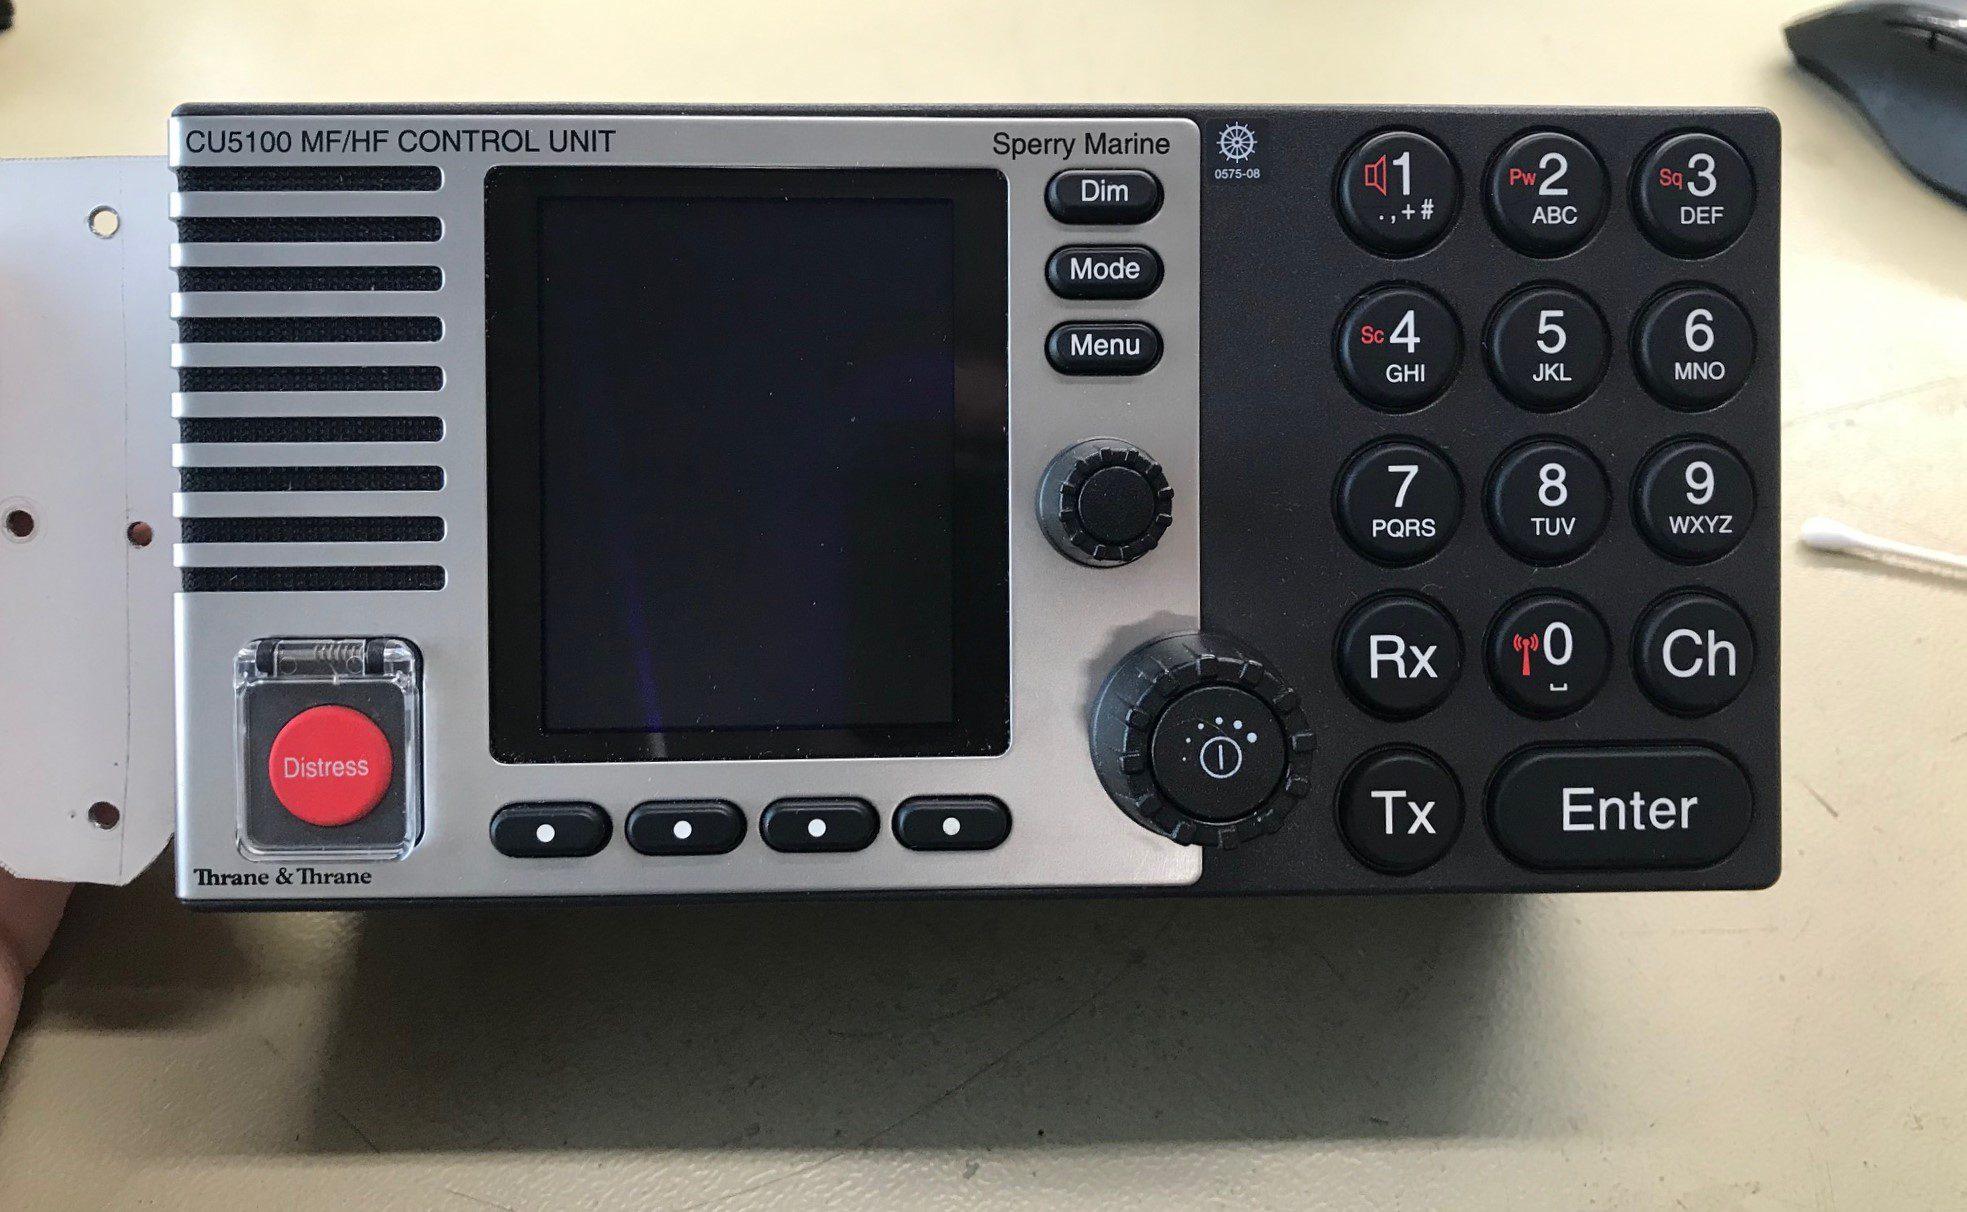 MF/HF Control unit – CU5100